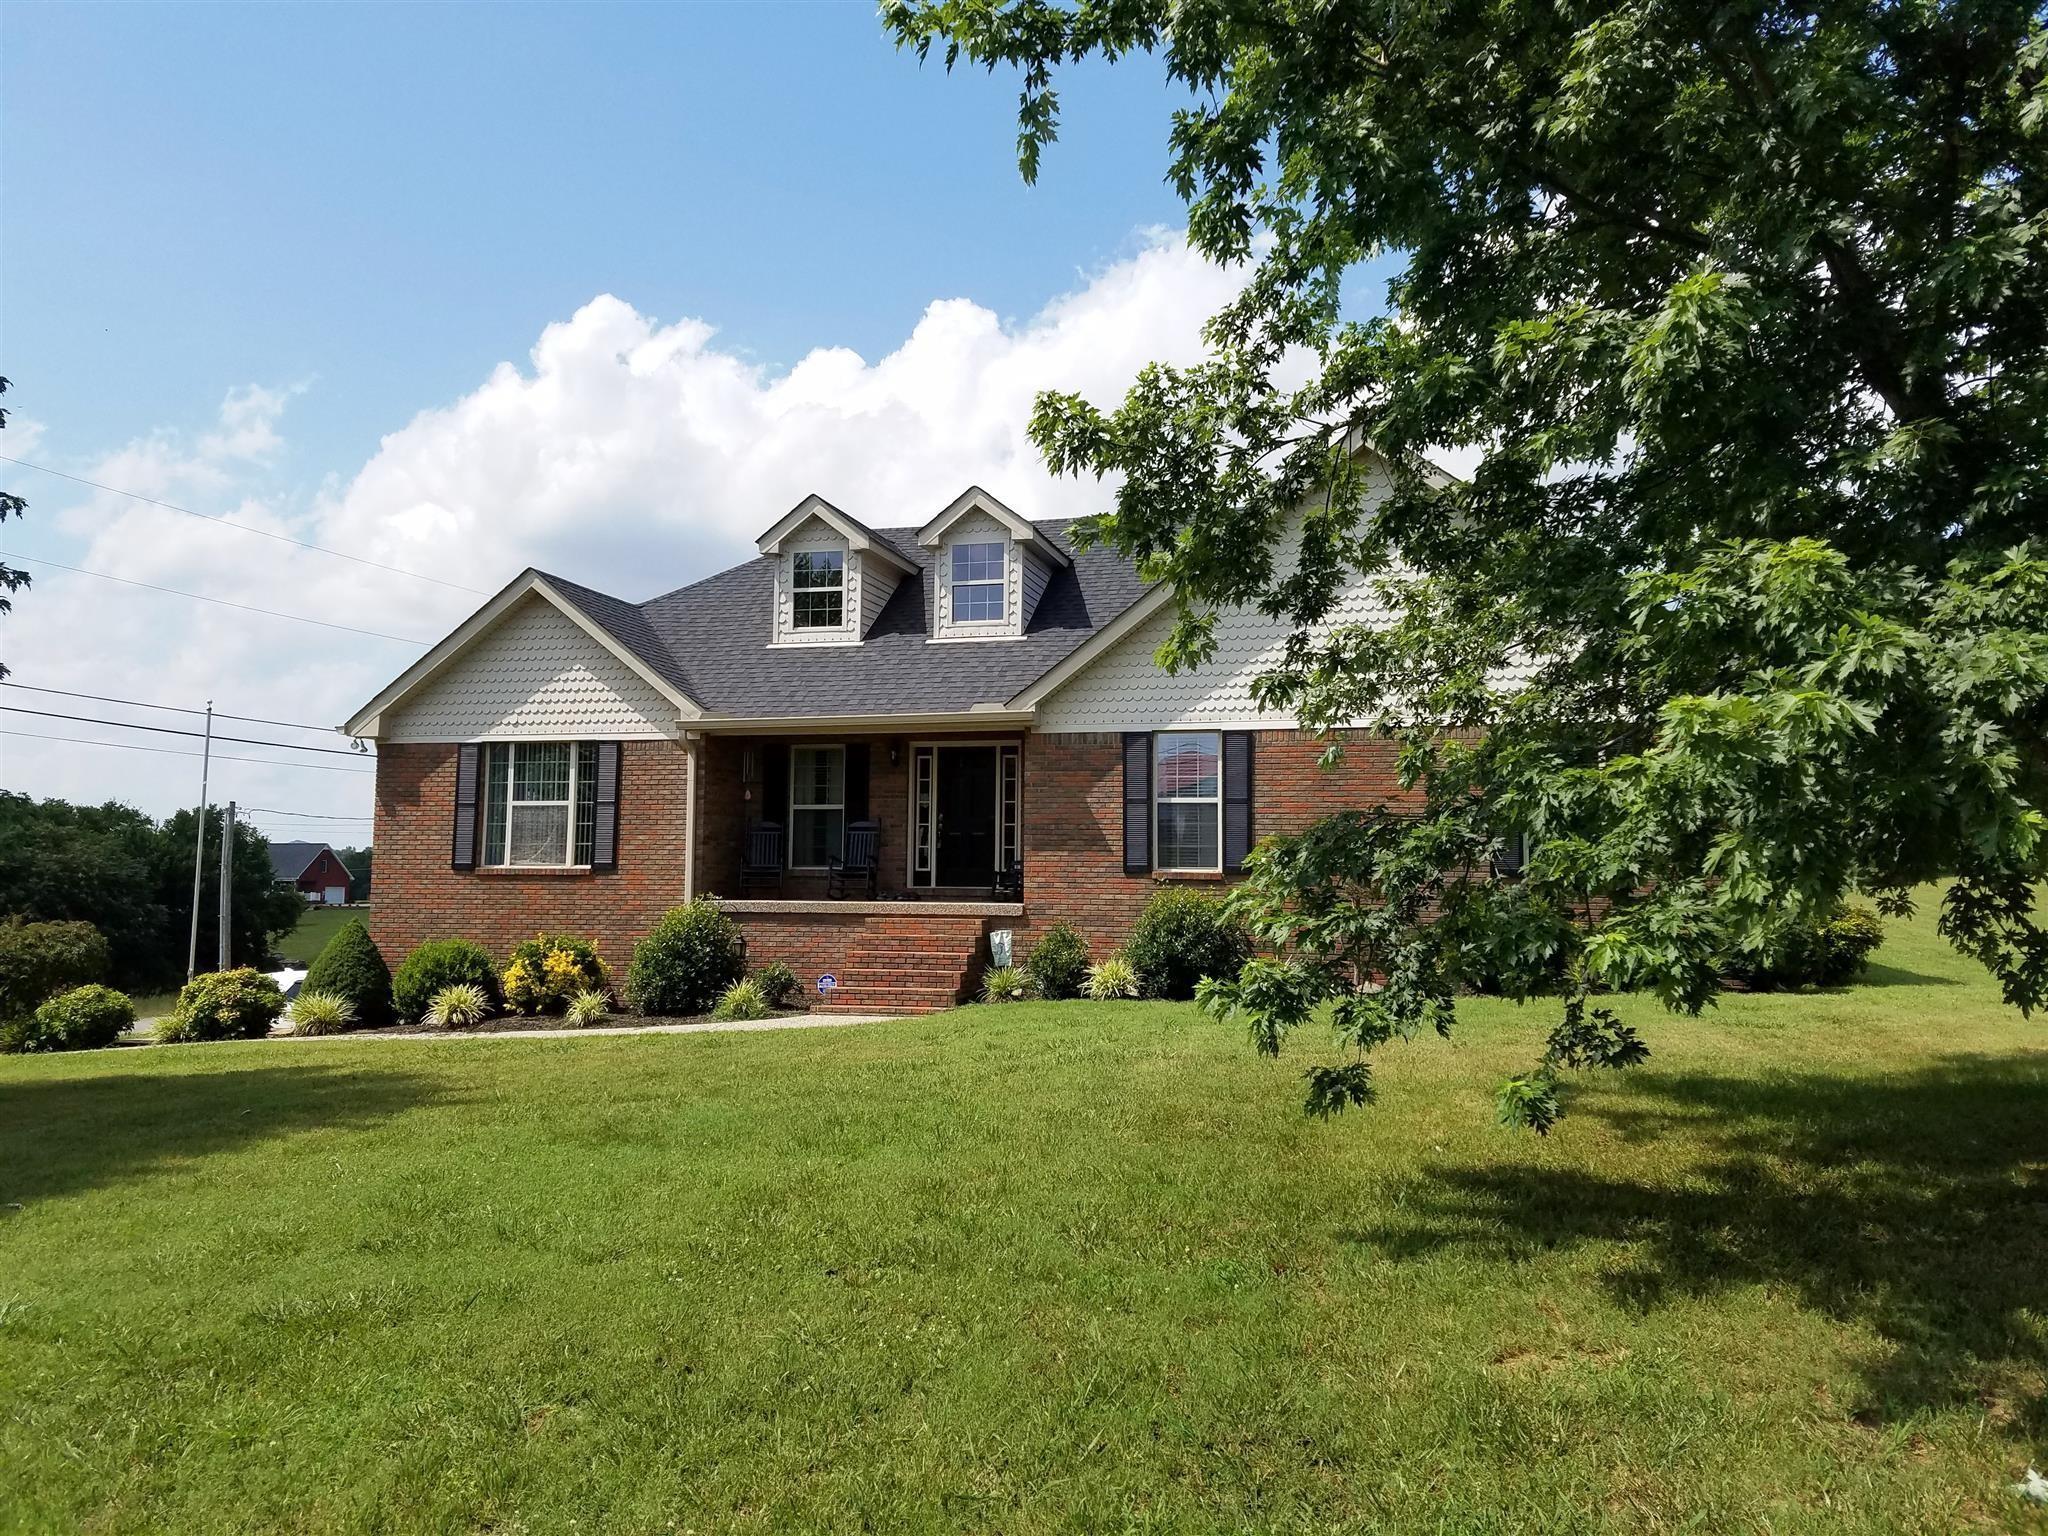 20 River Pointe Ln, Carthage, TN 37030 - Carthage, TN real estate listing